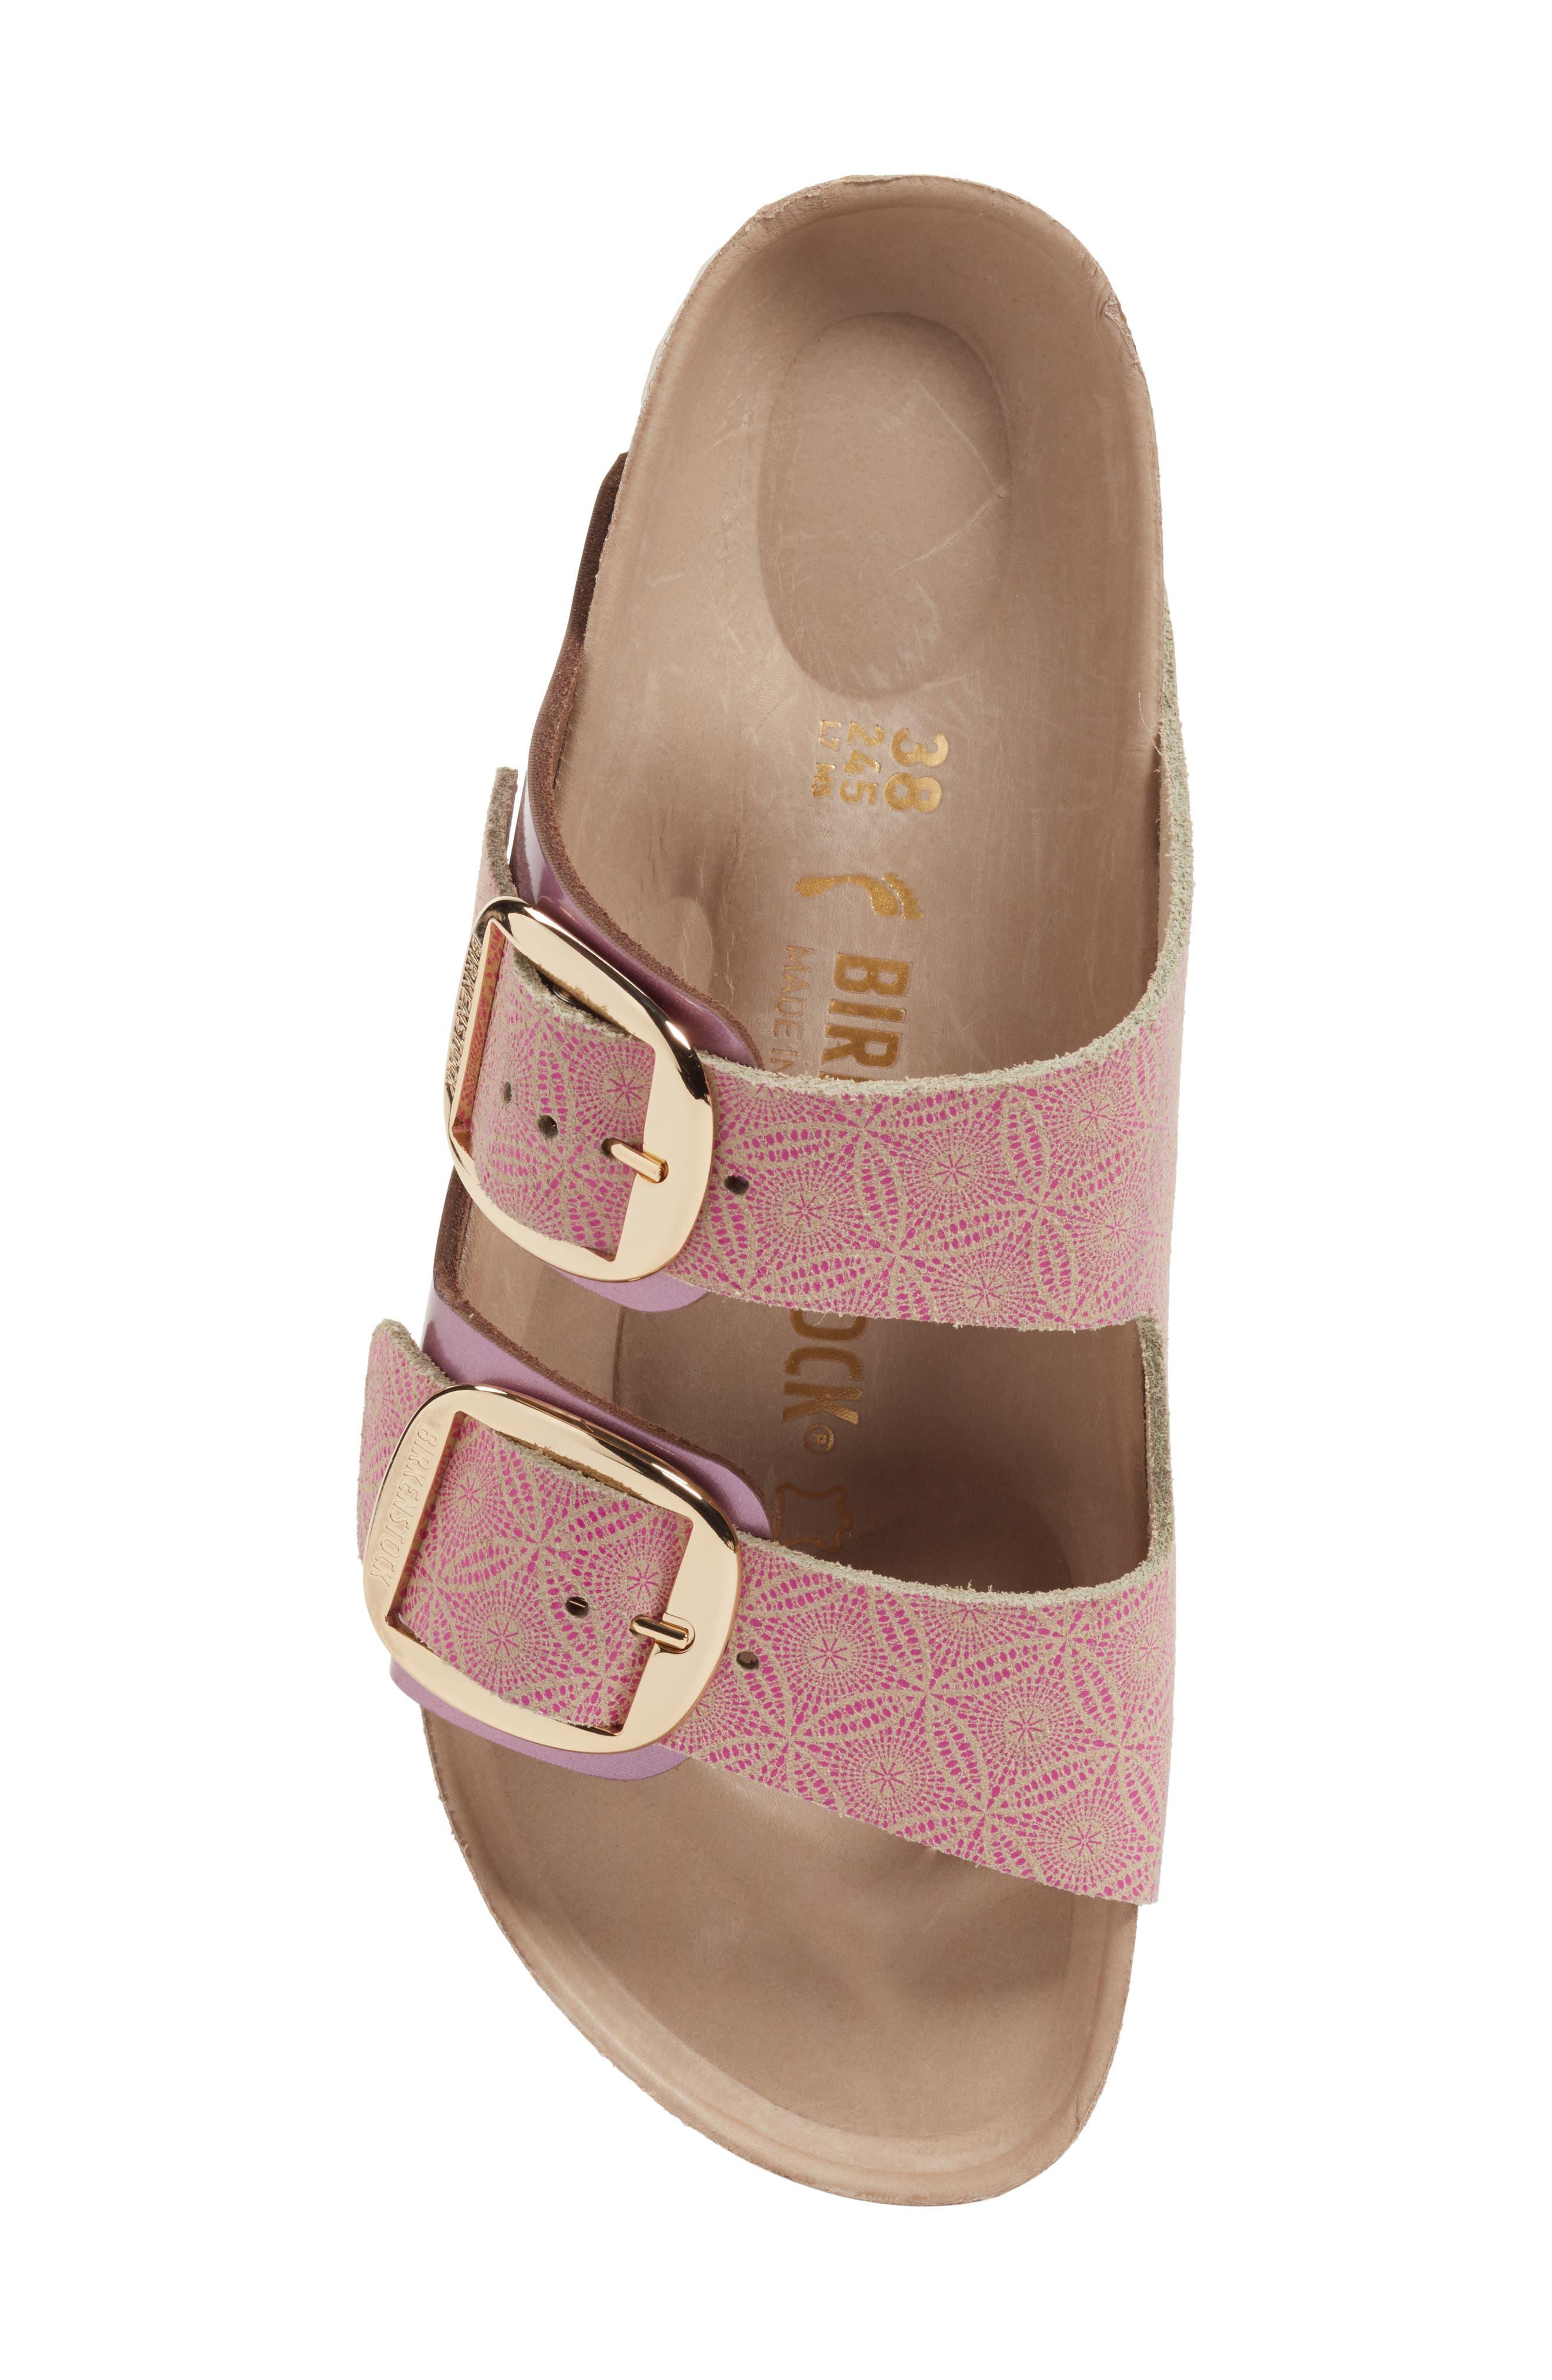 Arizona Big Buckle Slide Sandal,                             Alternate thumbnail 5, color,                             Ceramic Rose Leather